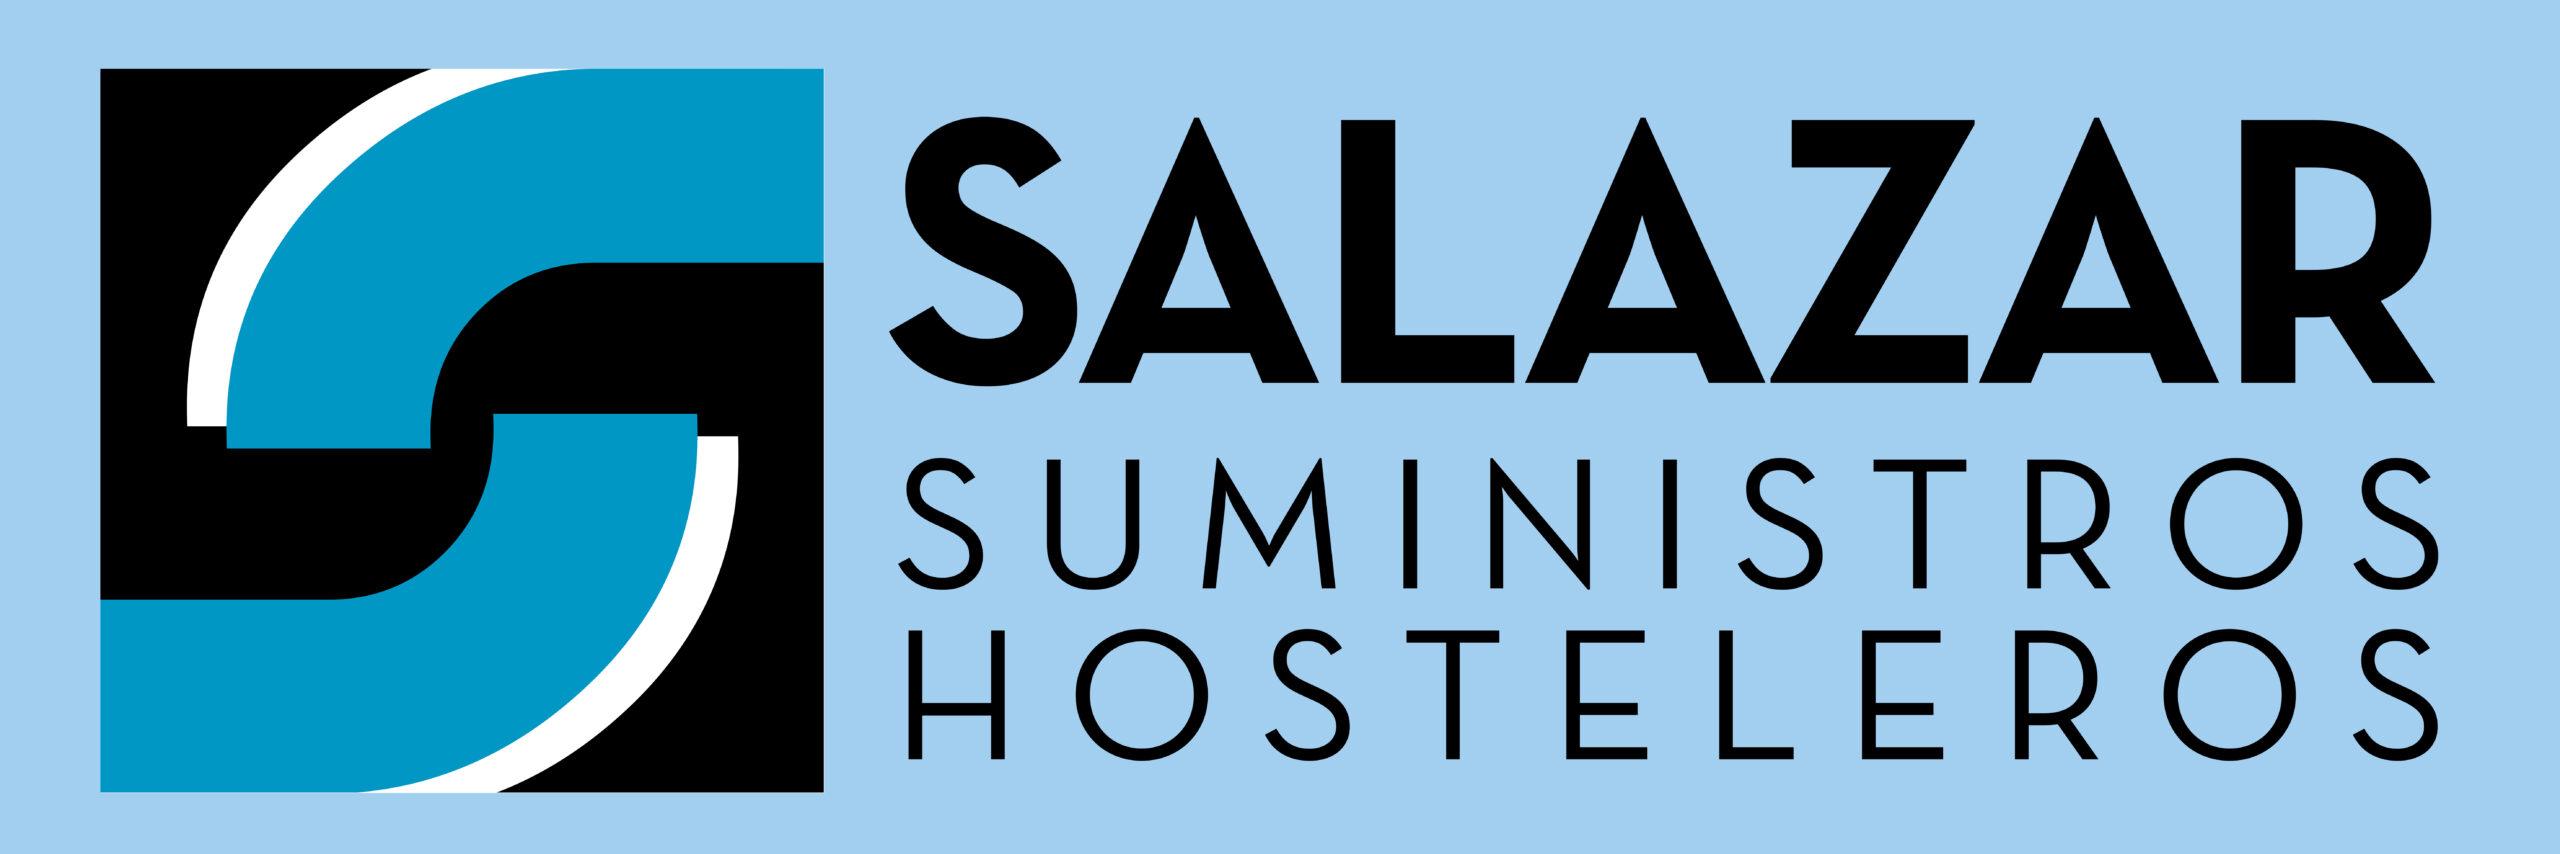 Salazar Suministros Hosteleros